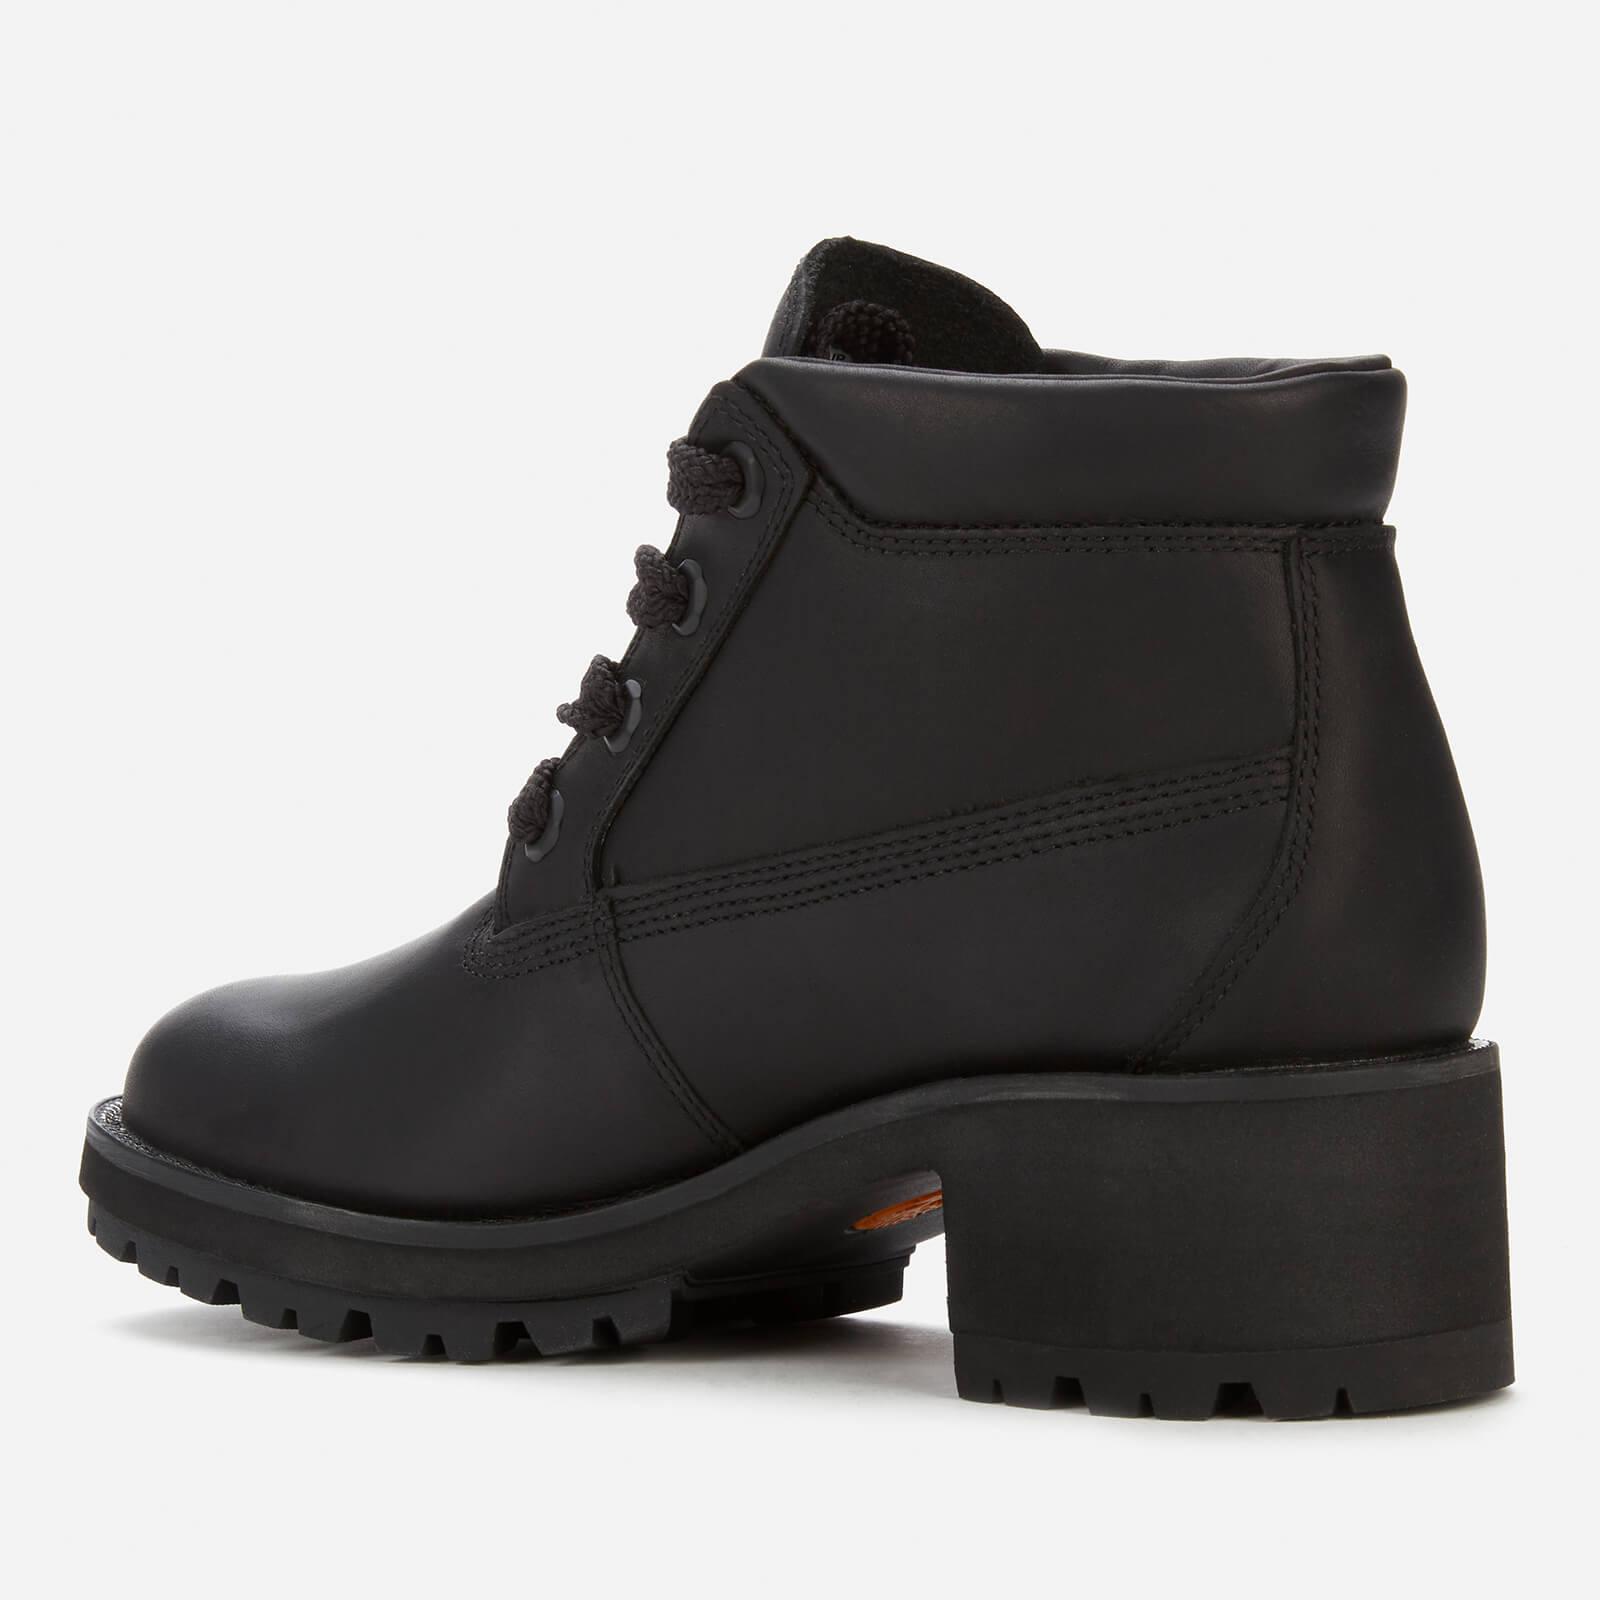 Timberland Women's Kinsley Waterproof Nellie Boots - Jet Black - Uk 3